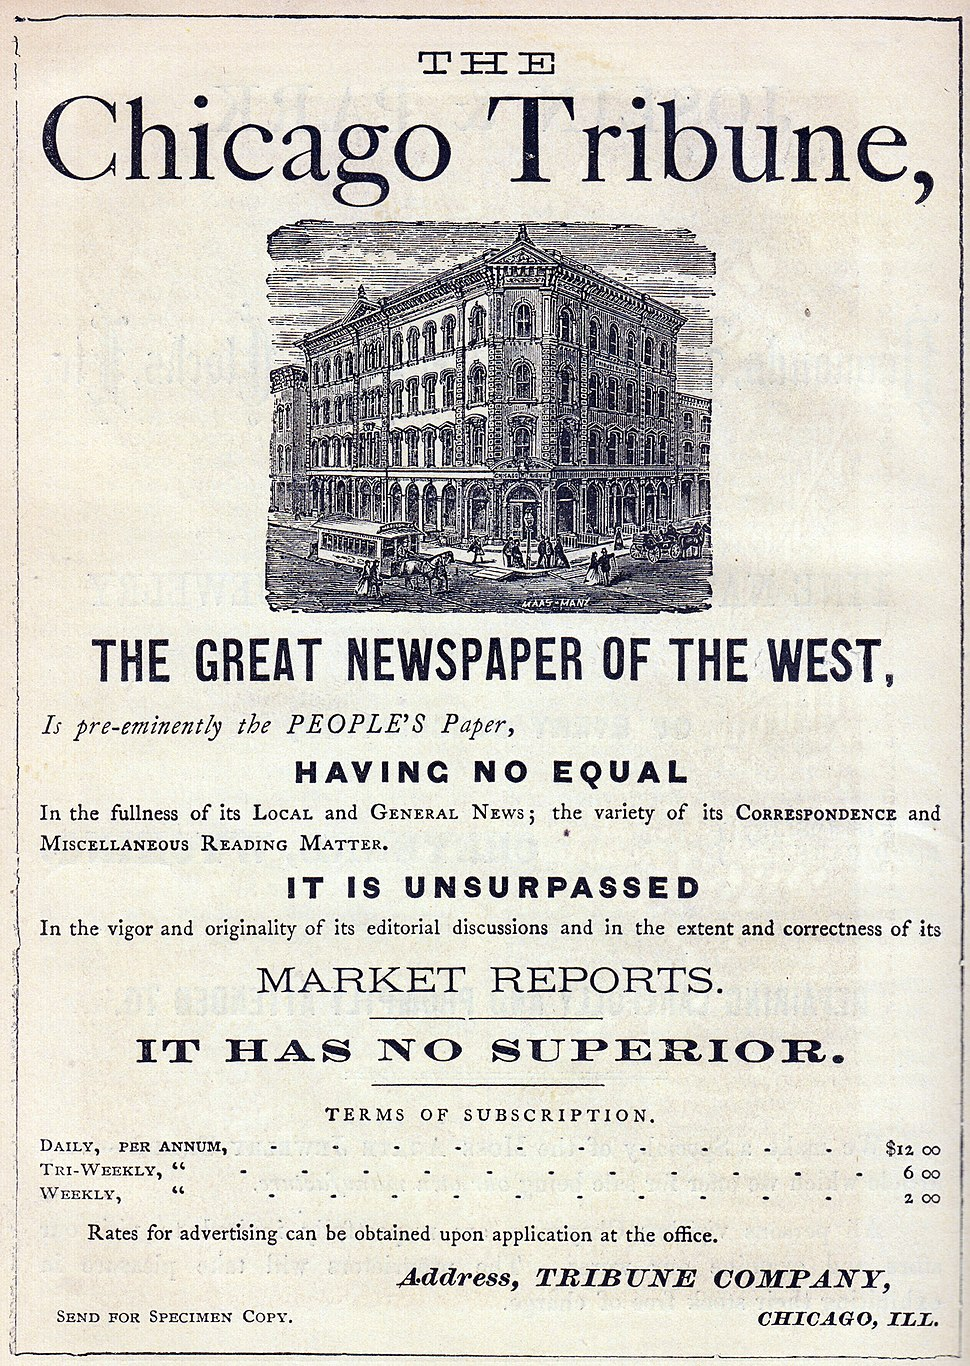 Chicago Tribune Advertisement 1870